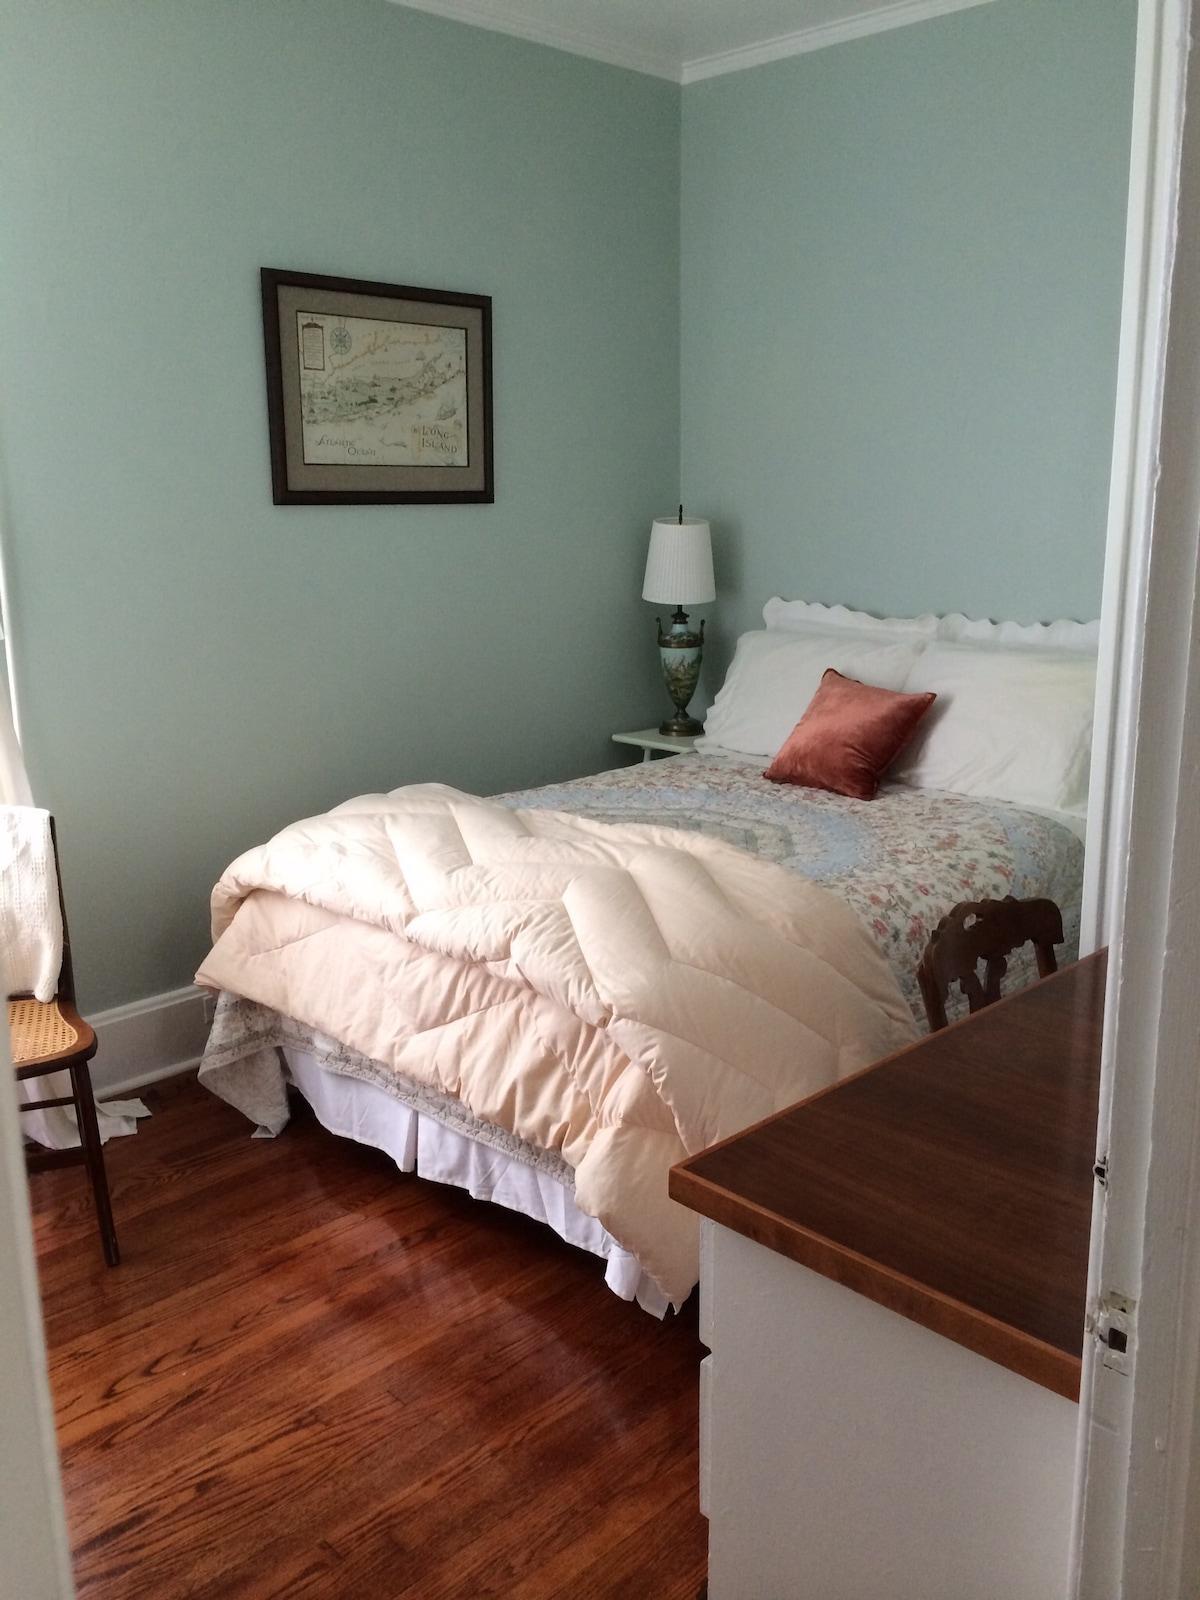 Bedroom picture # 2